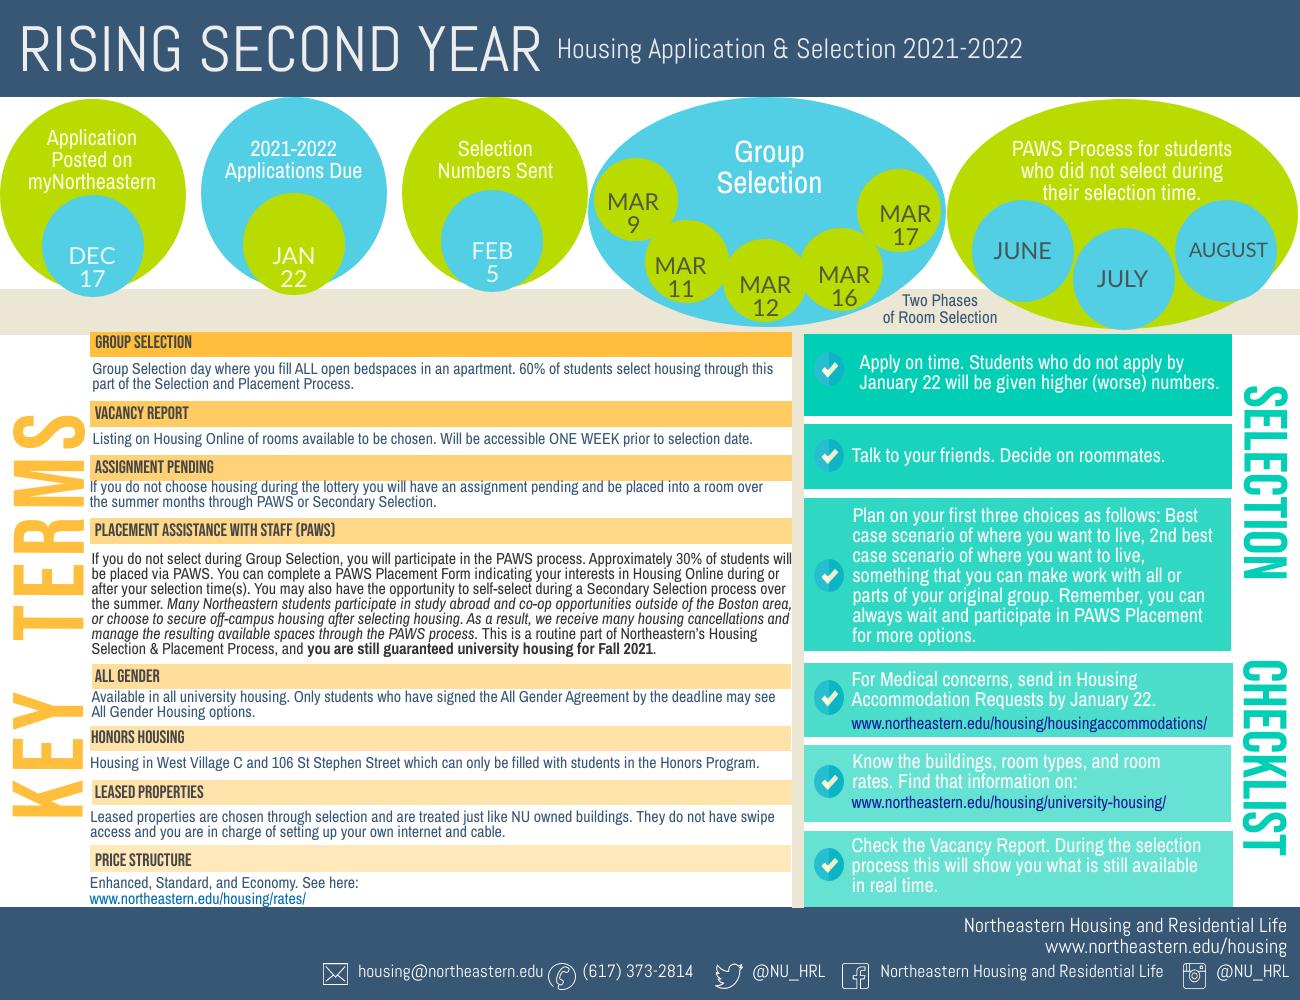 Neu Calendar 2022.Northeastern University Housing Fall And Spring Application Selection